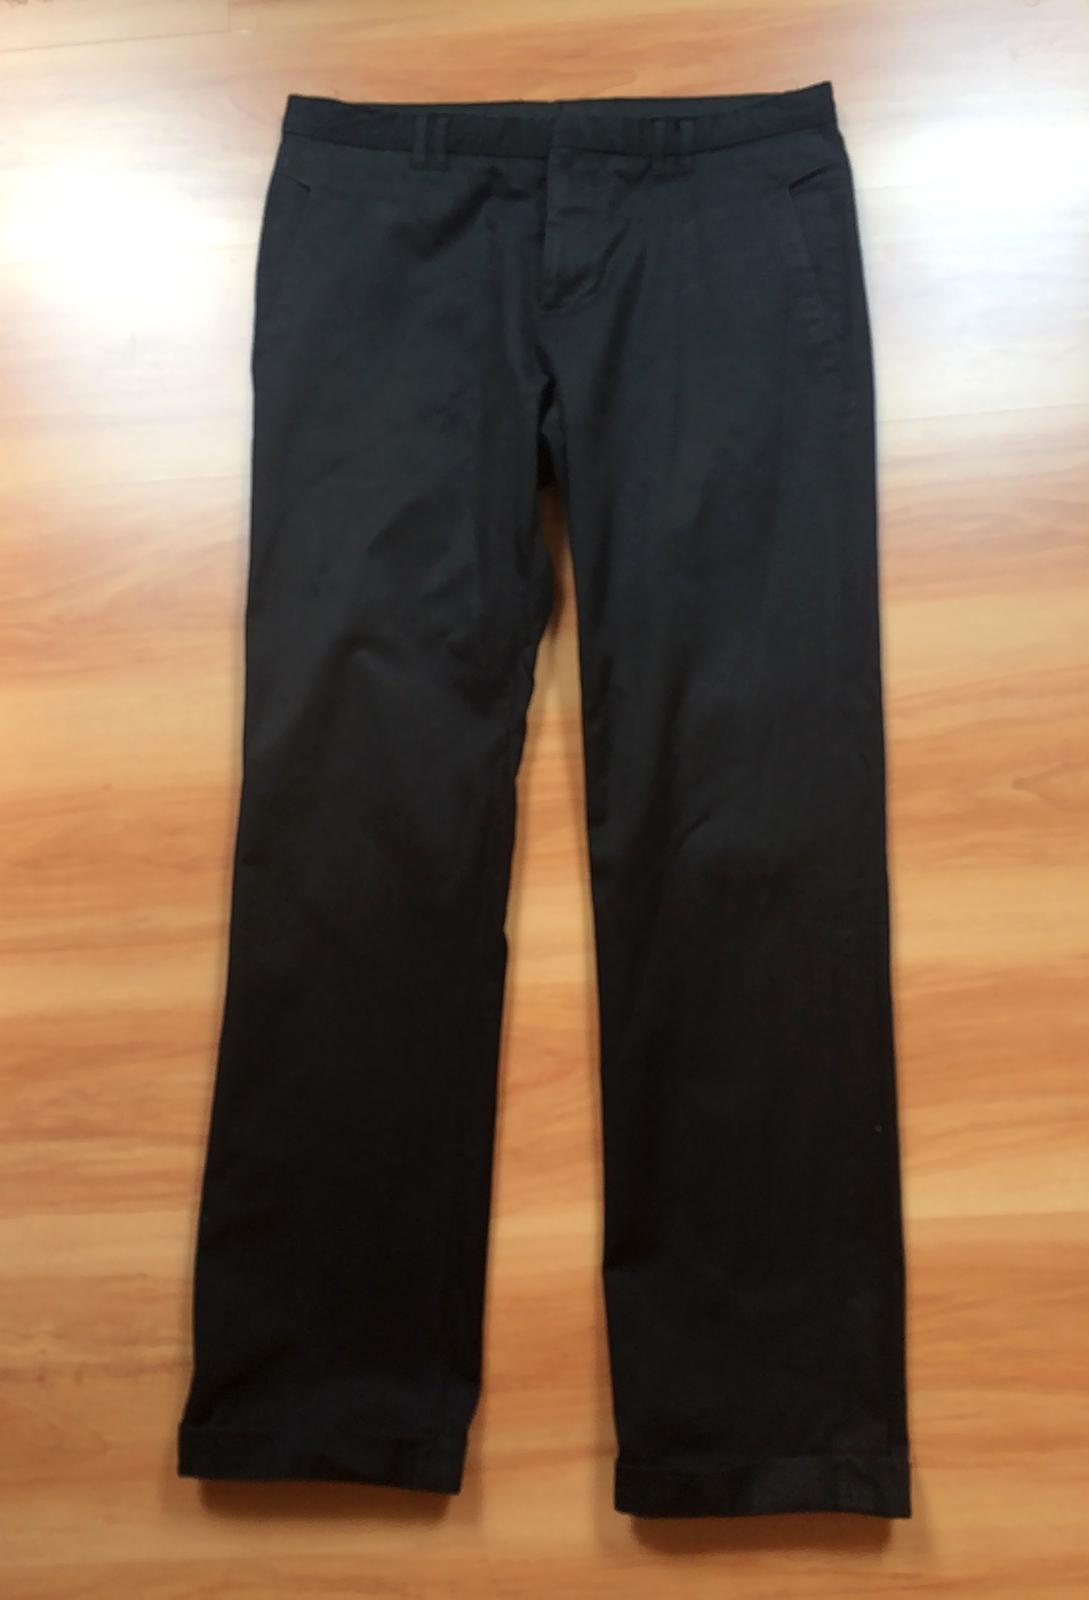 98432769e4ac Čierne nohavice s tenkými pásikmi